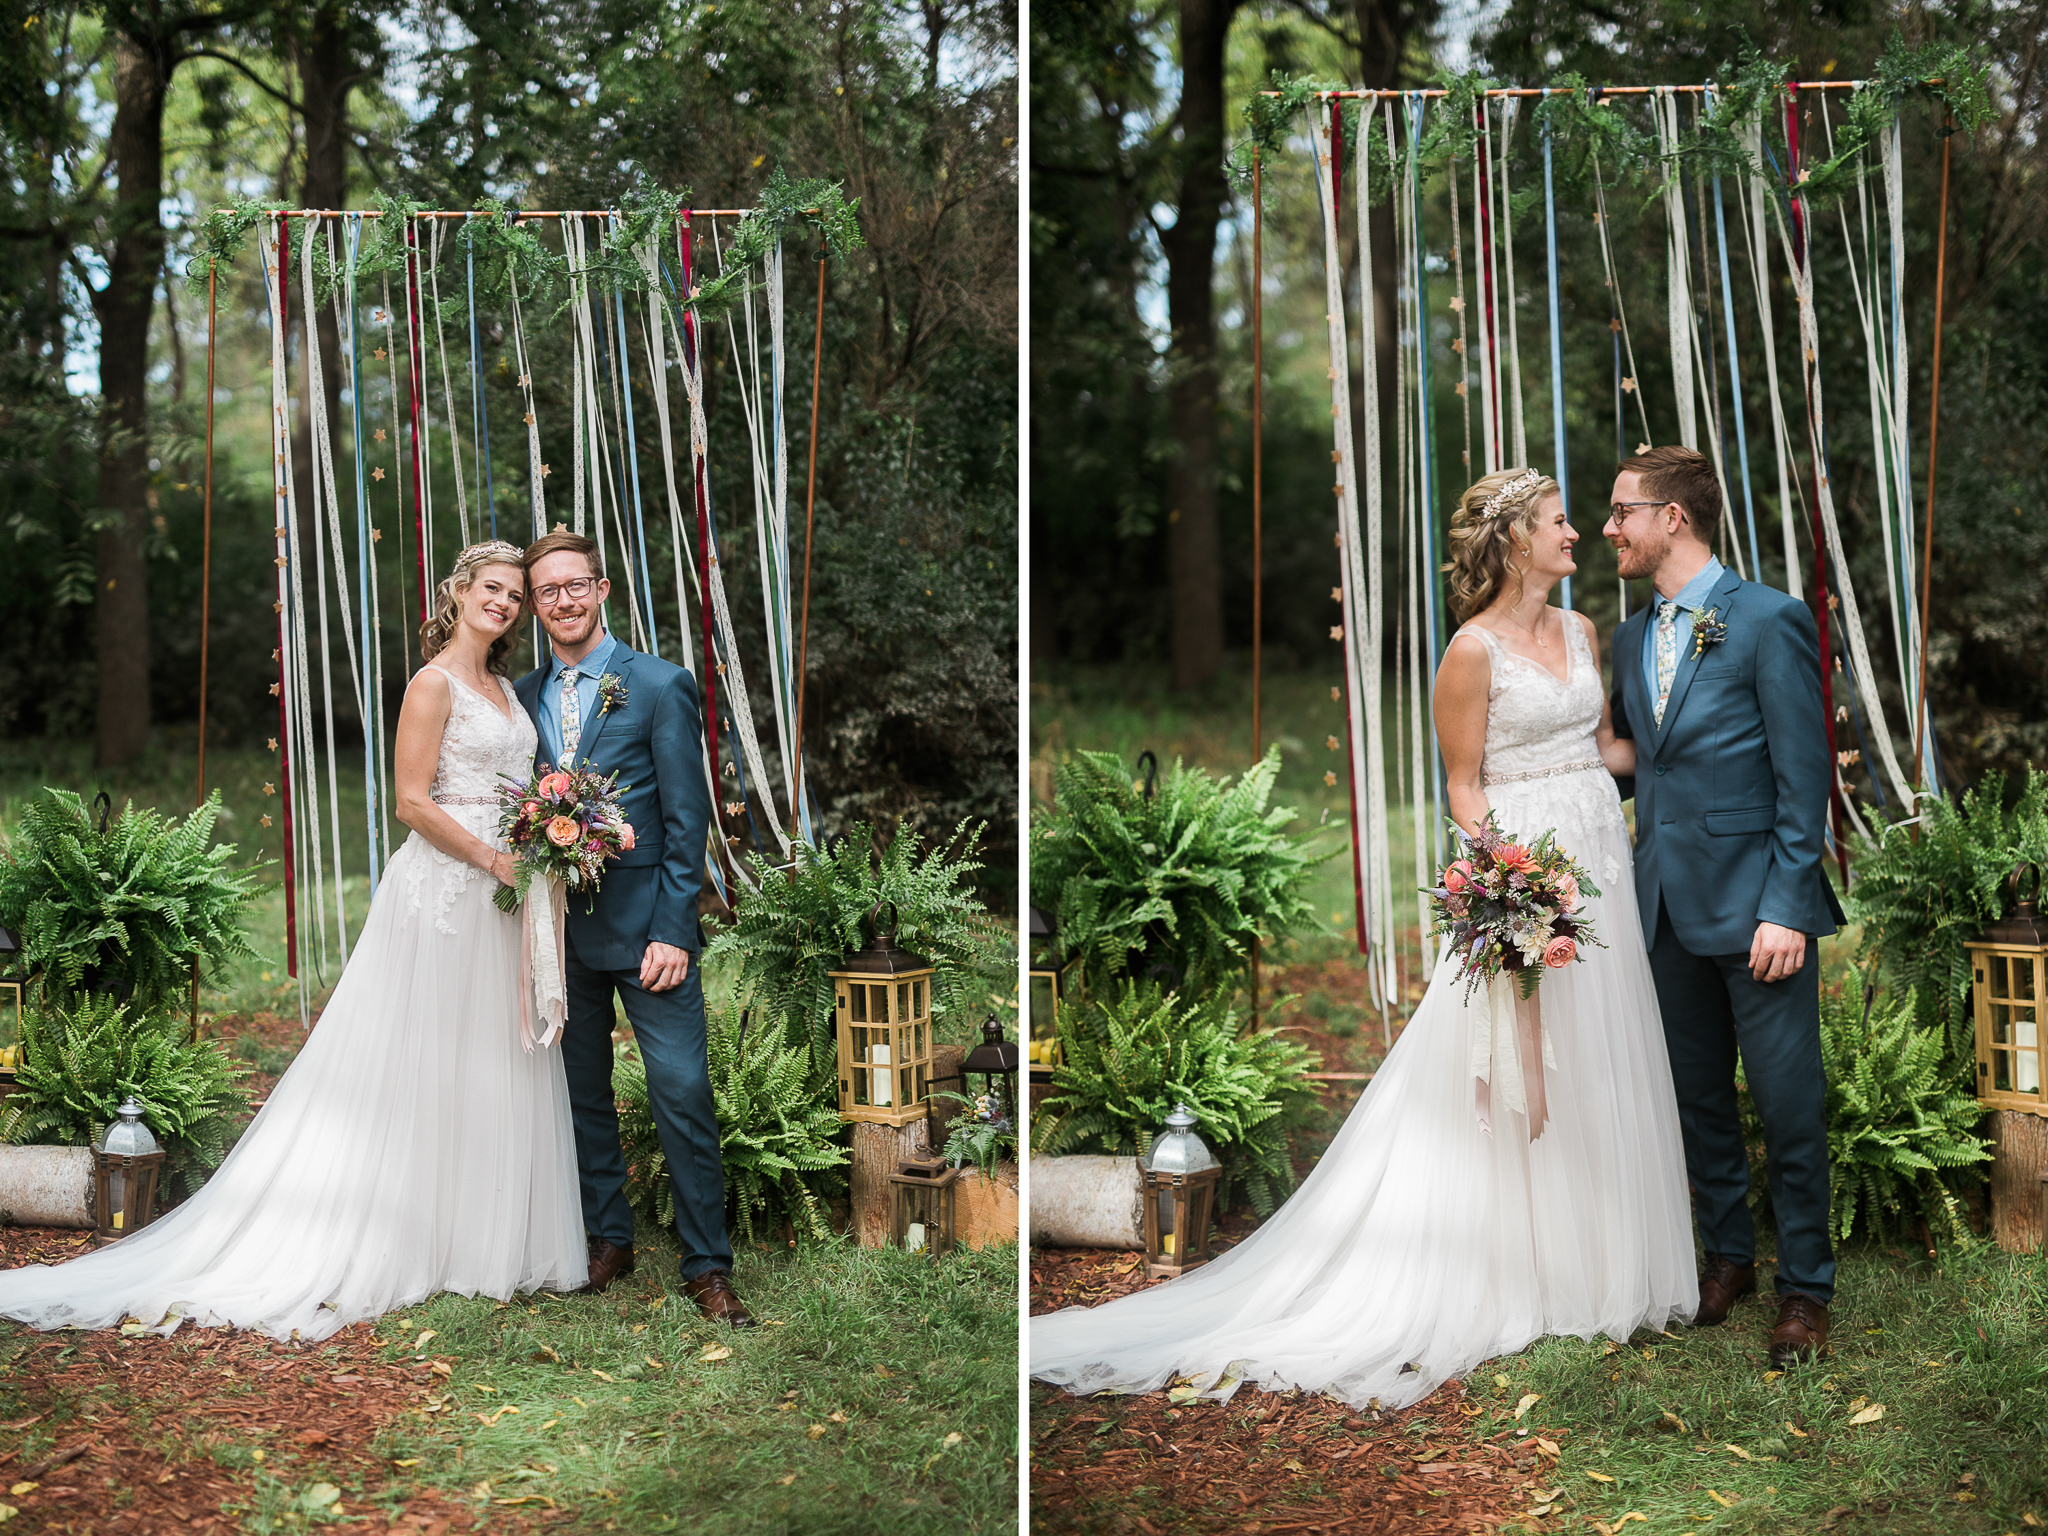 Paoli-Mill-wedding-summer-Wisconsin_050.jpg